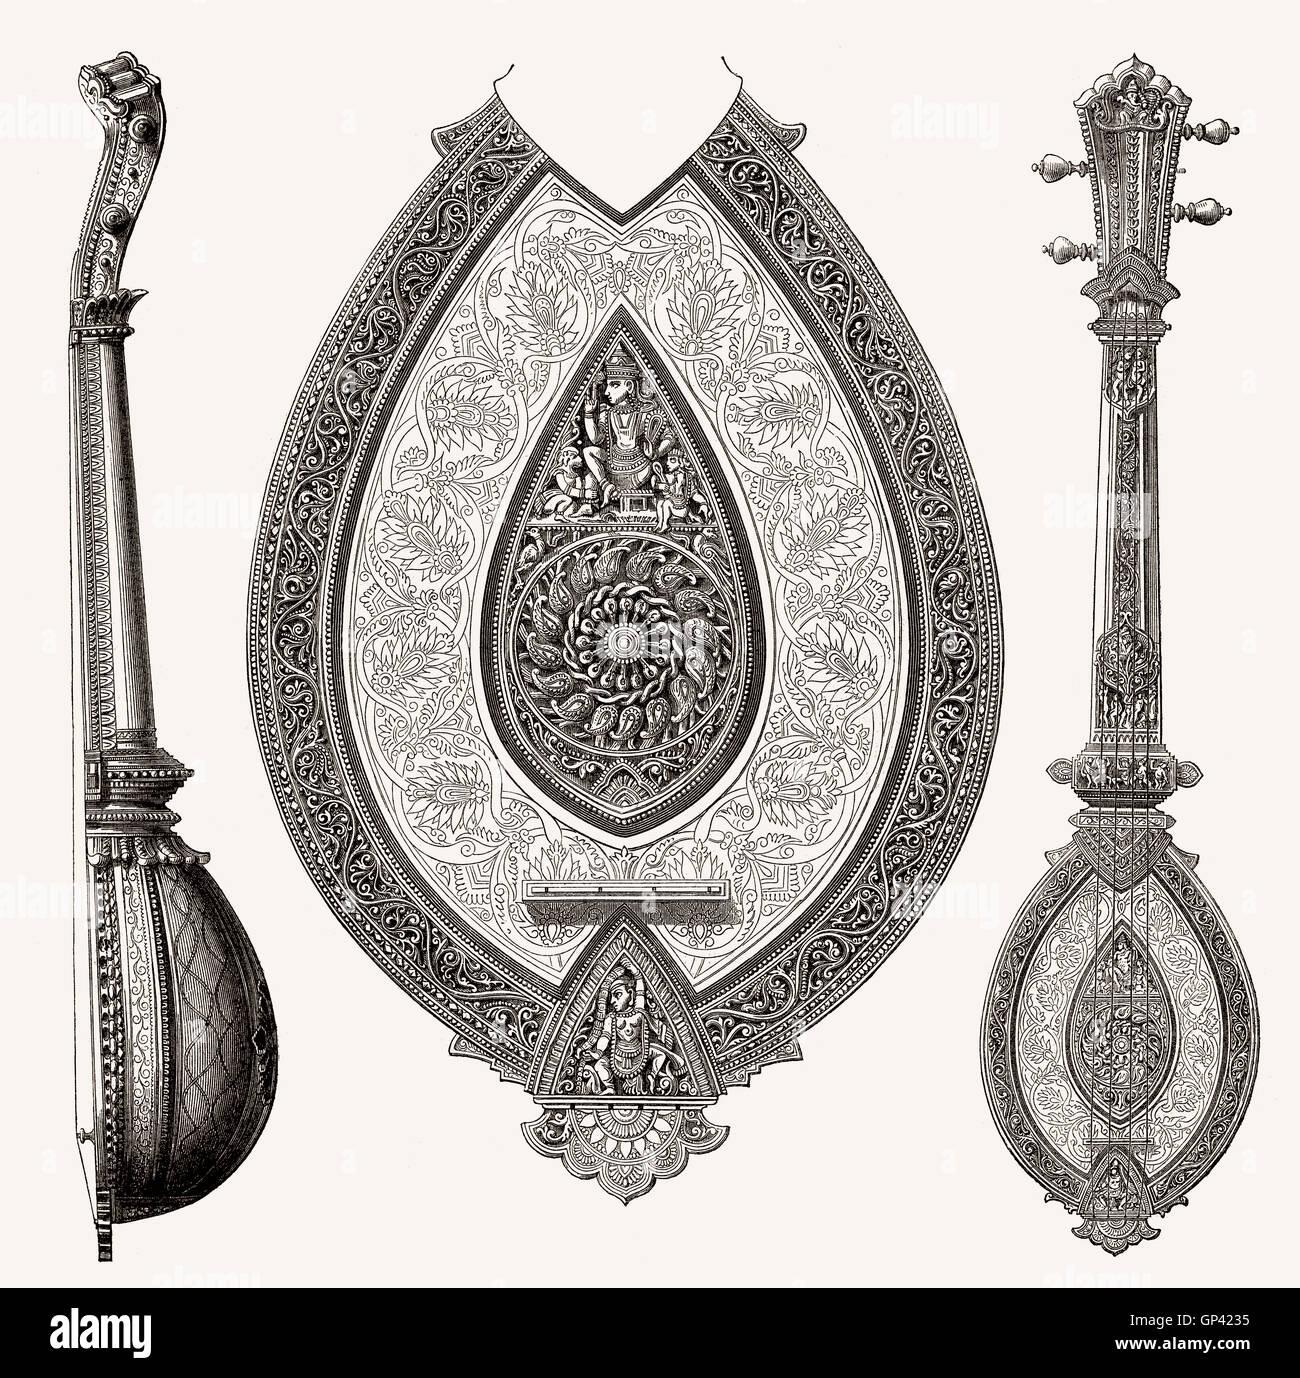 Alte indische Saiteninstrument, 19. Jahrhundert Stockbild